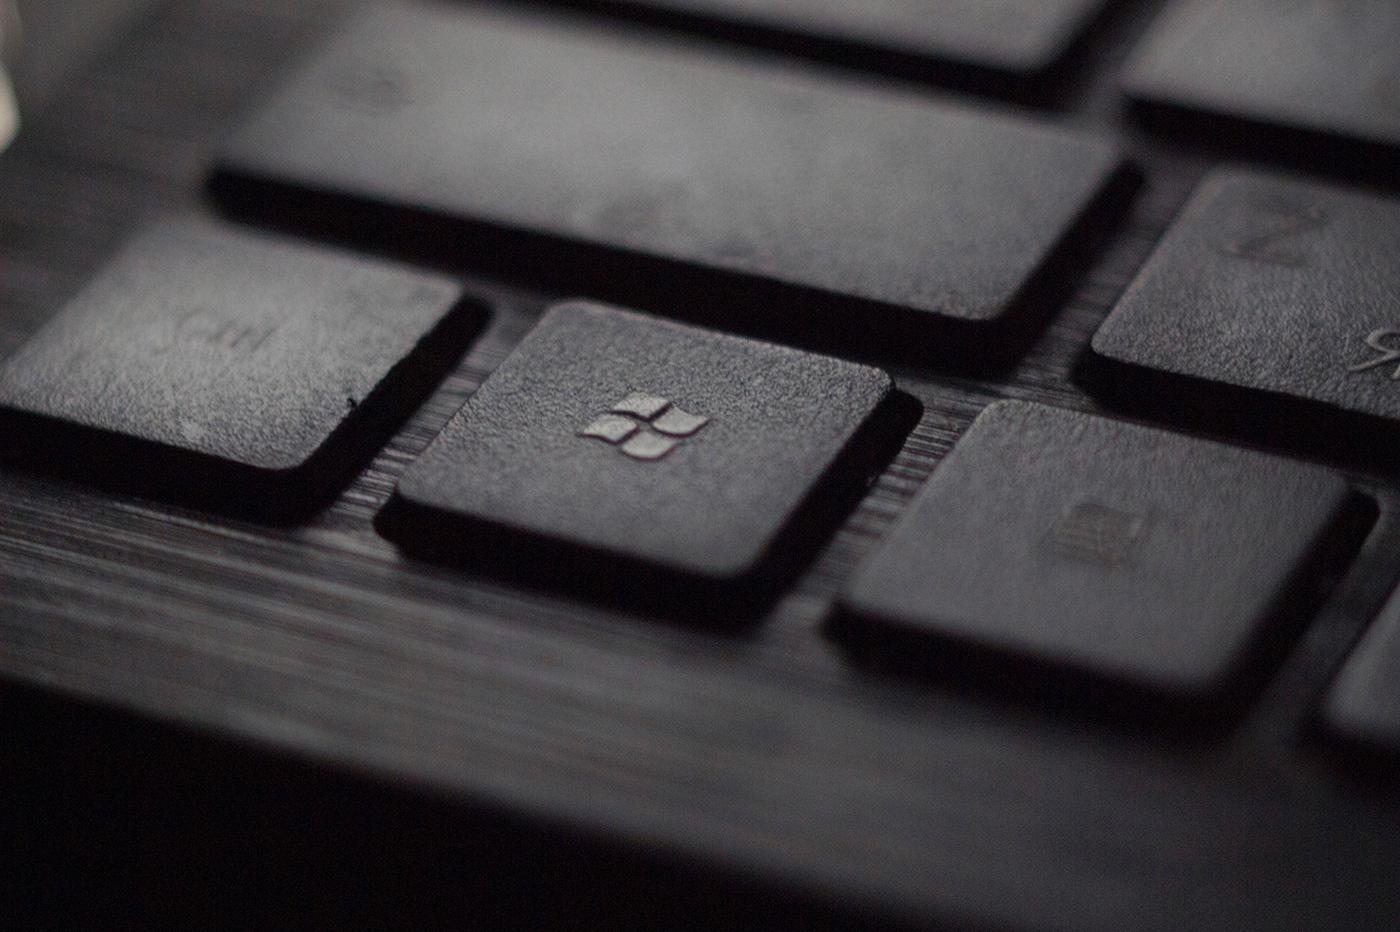 Microsoft ordinateur